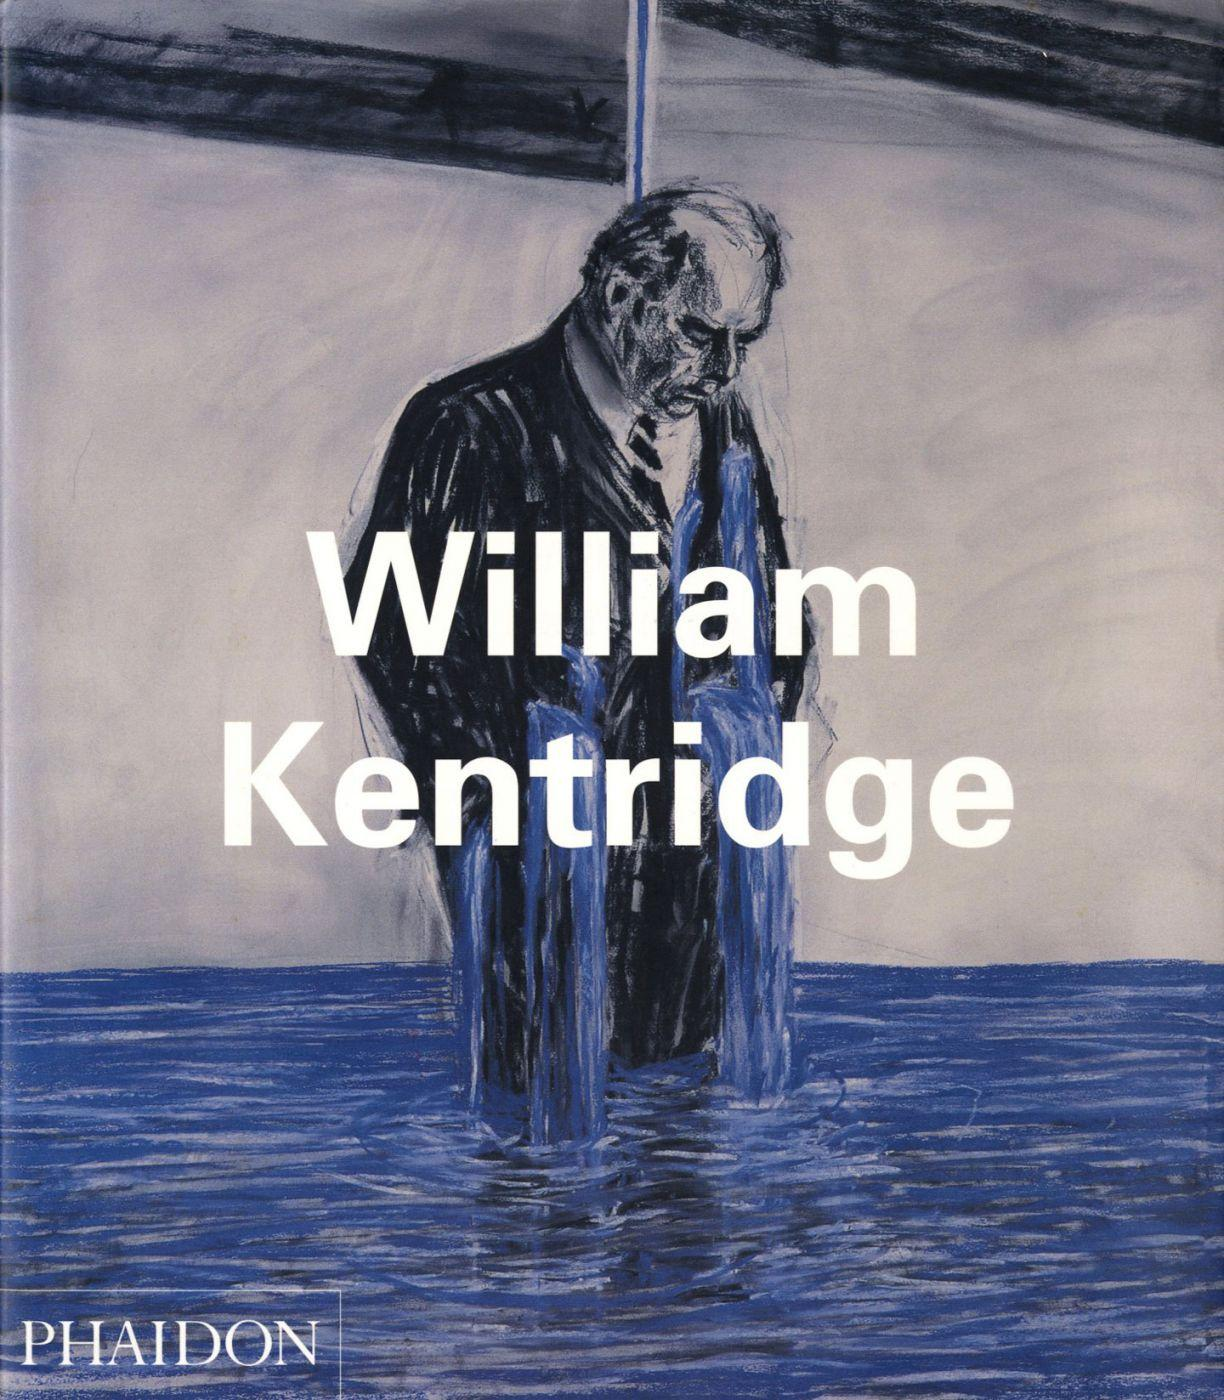 William Kentridge (Phaidon Contemporary